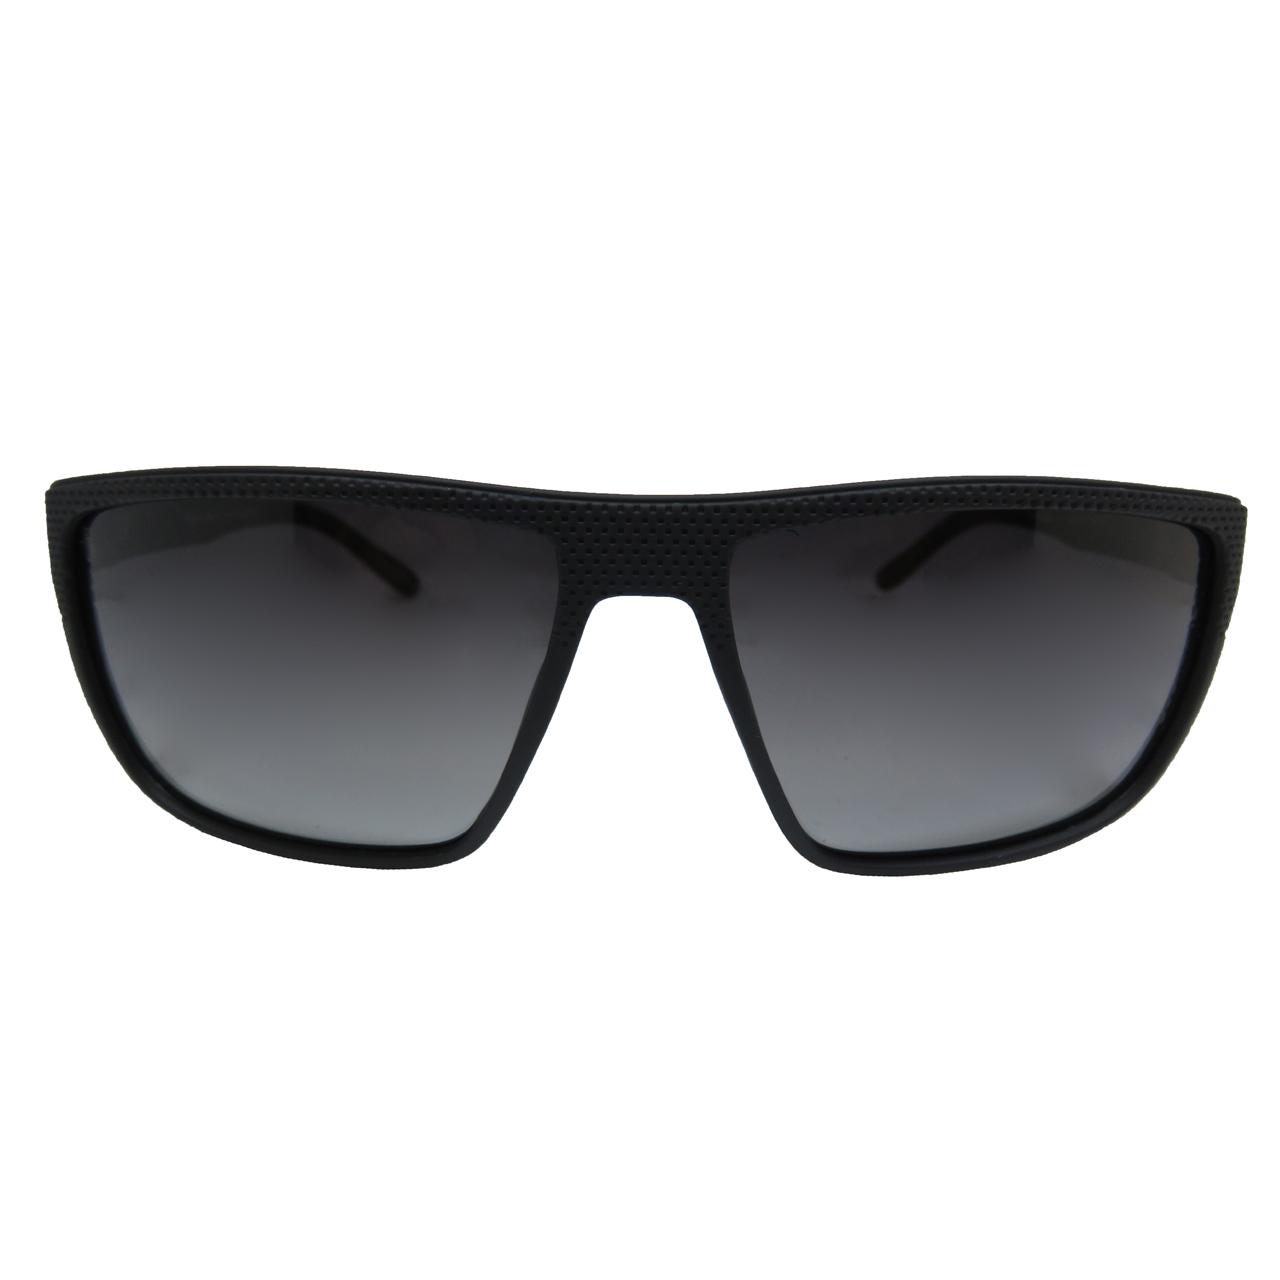 عینک آفتابی مدل OG3580 C4-MO8-1